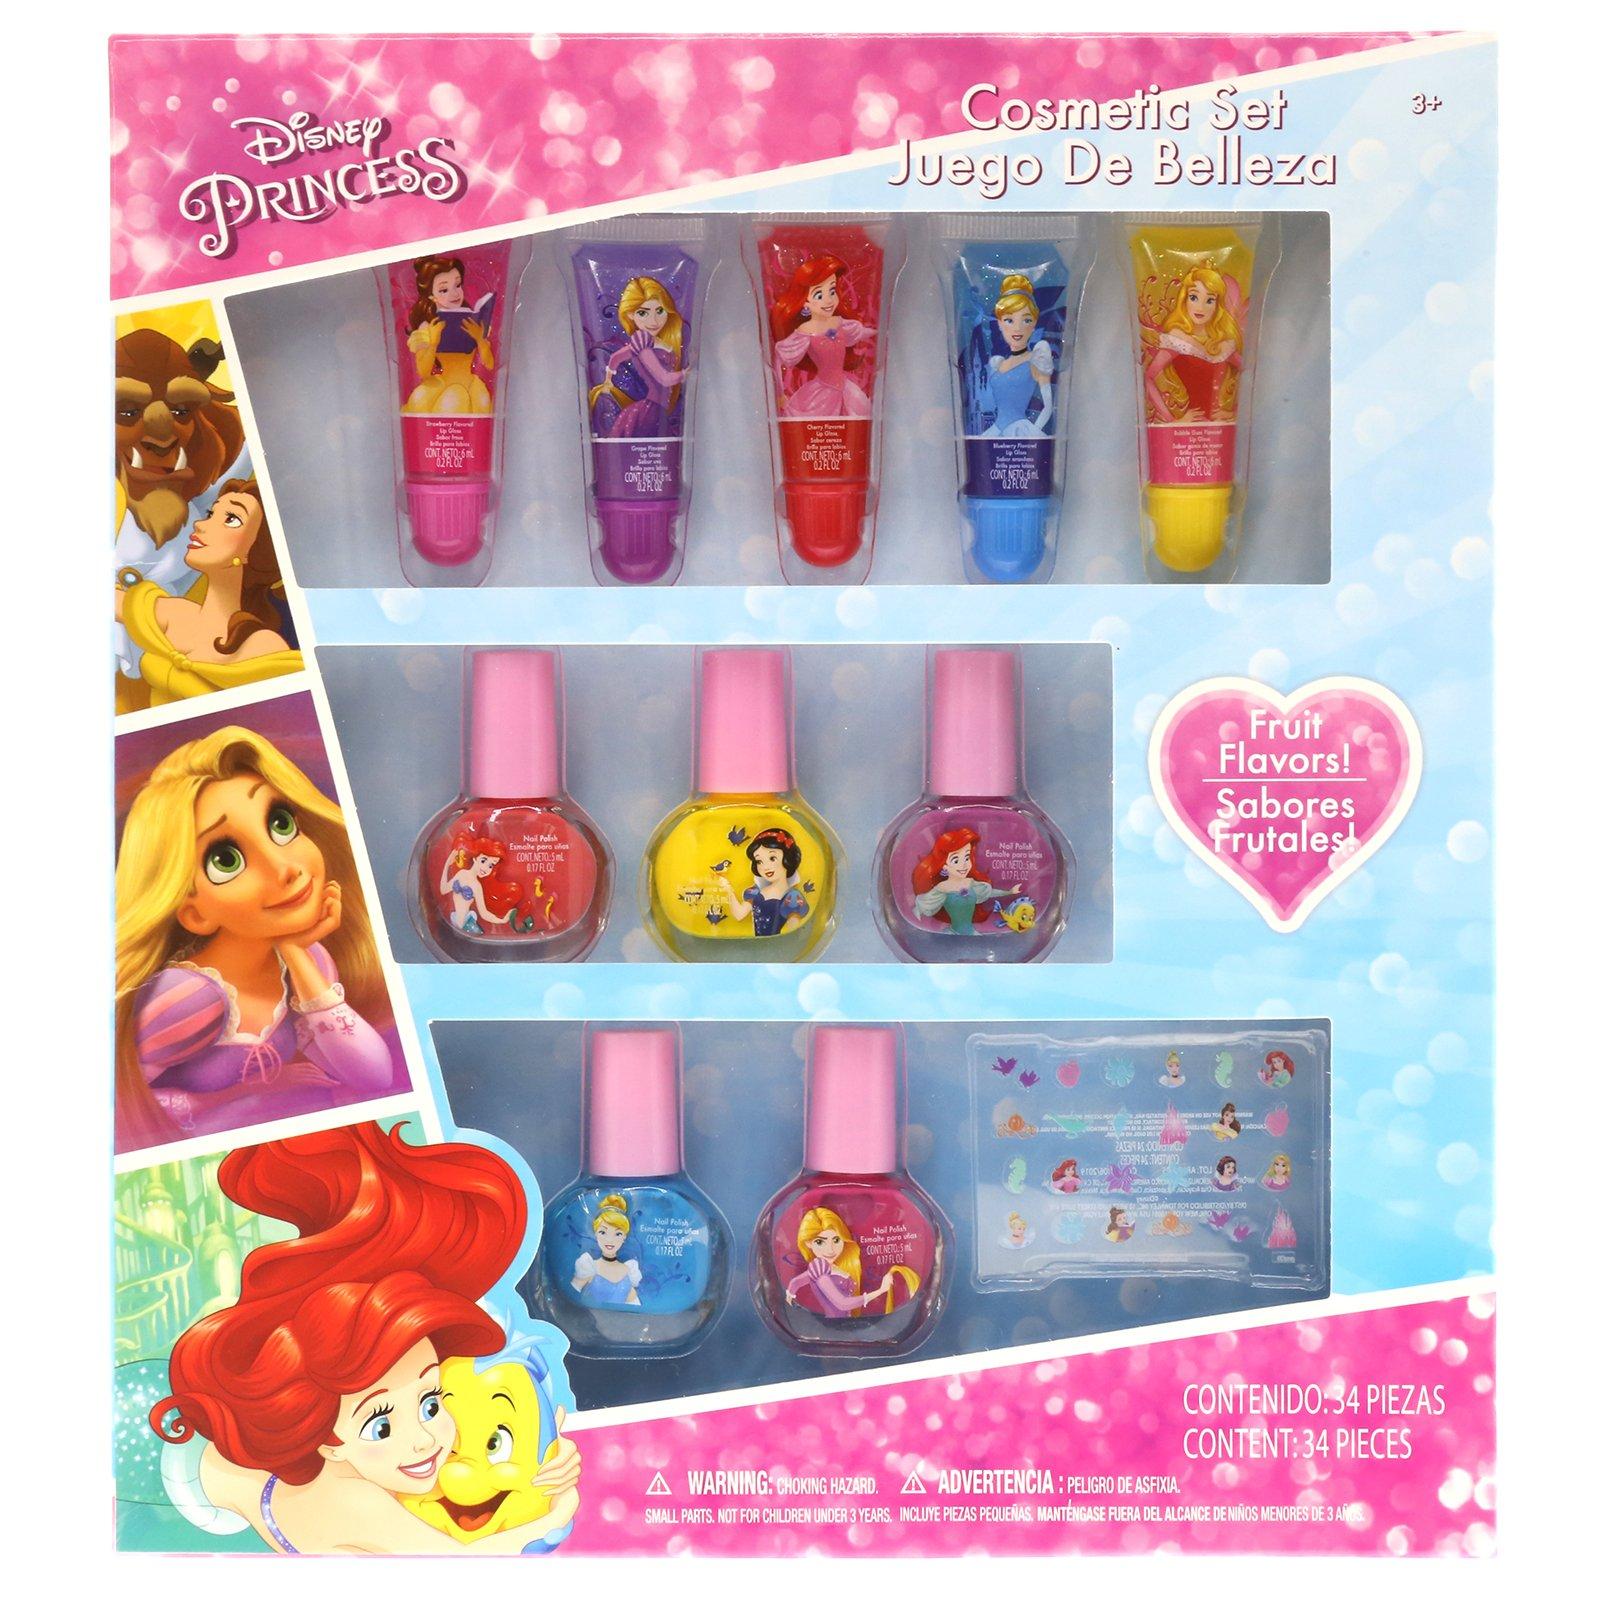 Disney Lip & Nail Set with Stickers Kids Beauty, Princess